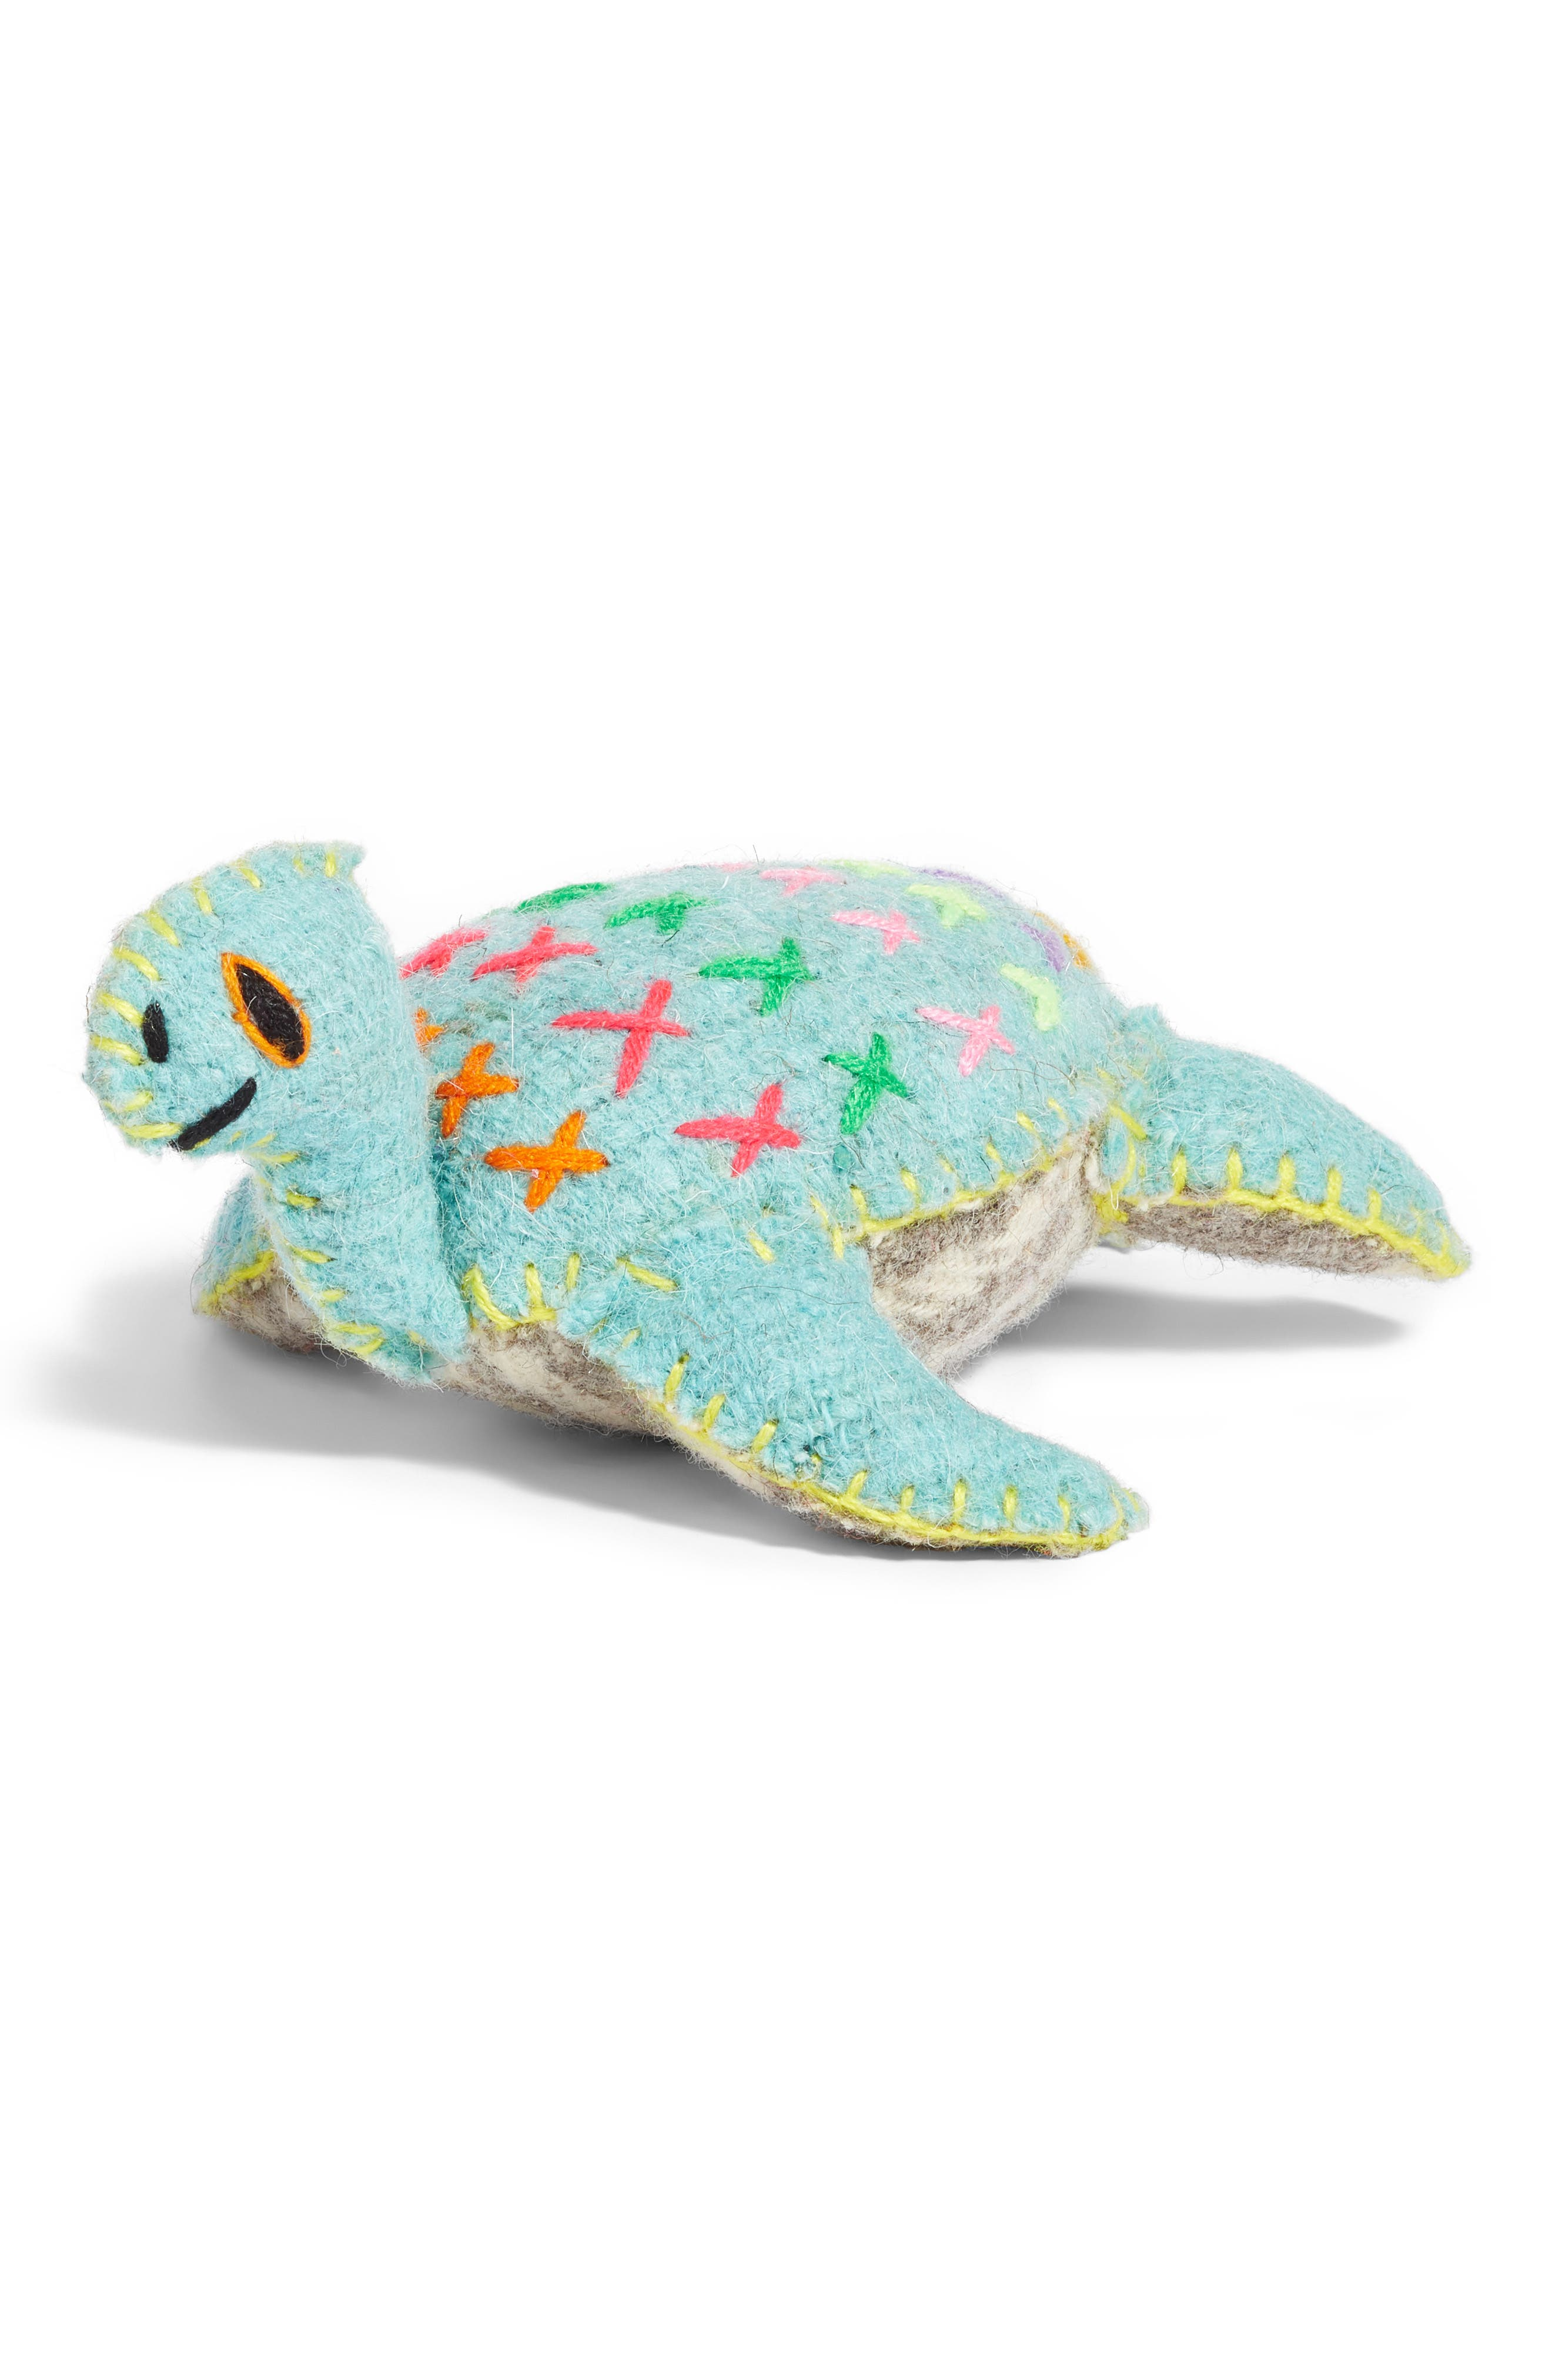 Sea Turtle Stuffed Animal,                             Main thumbnail 1, color,                             960